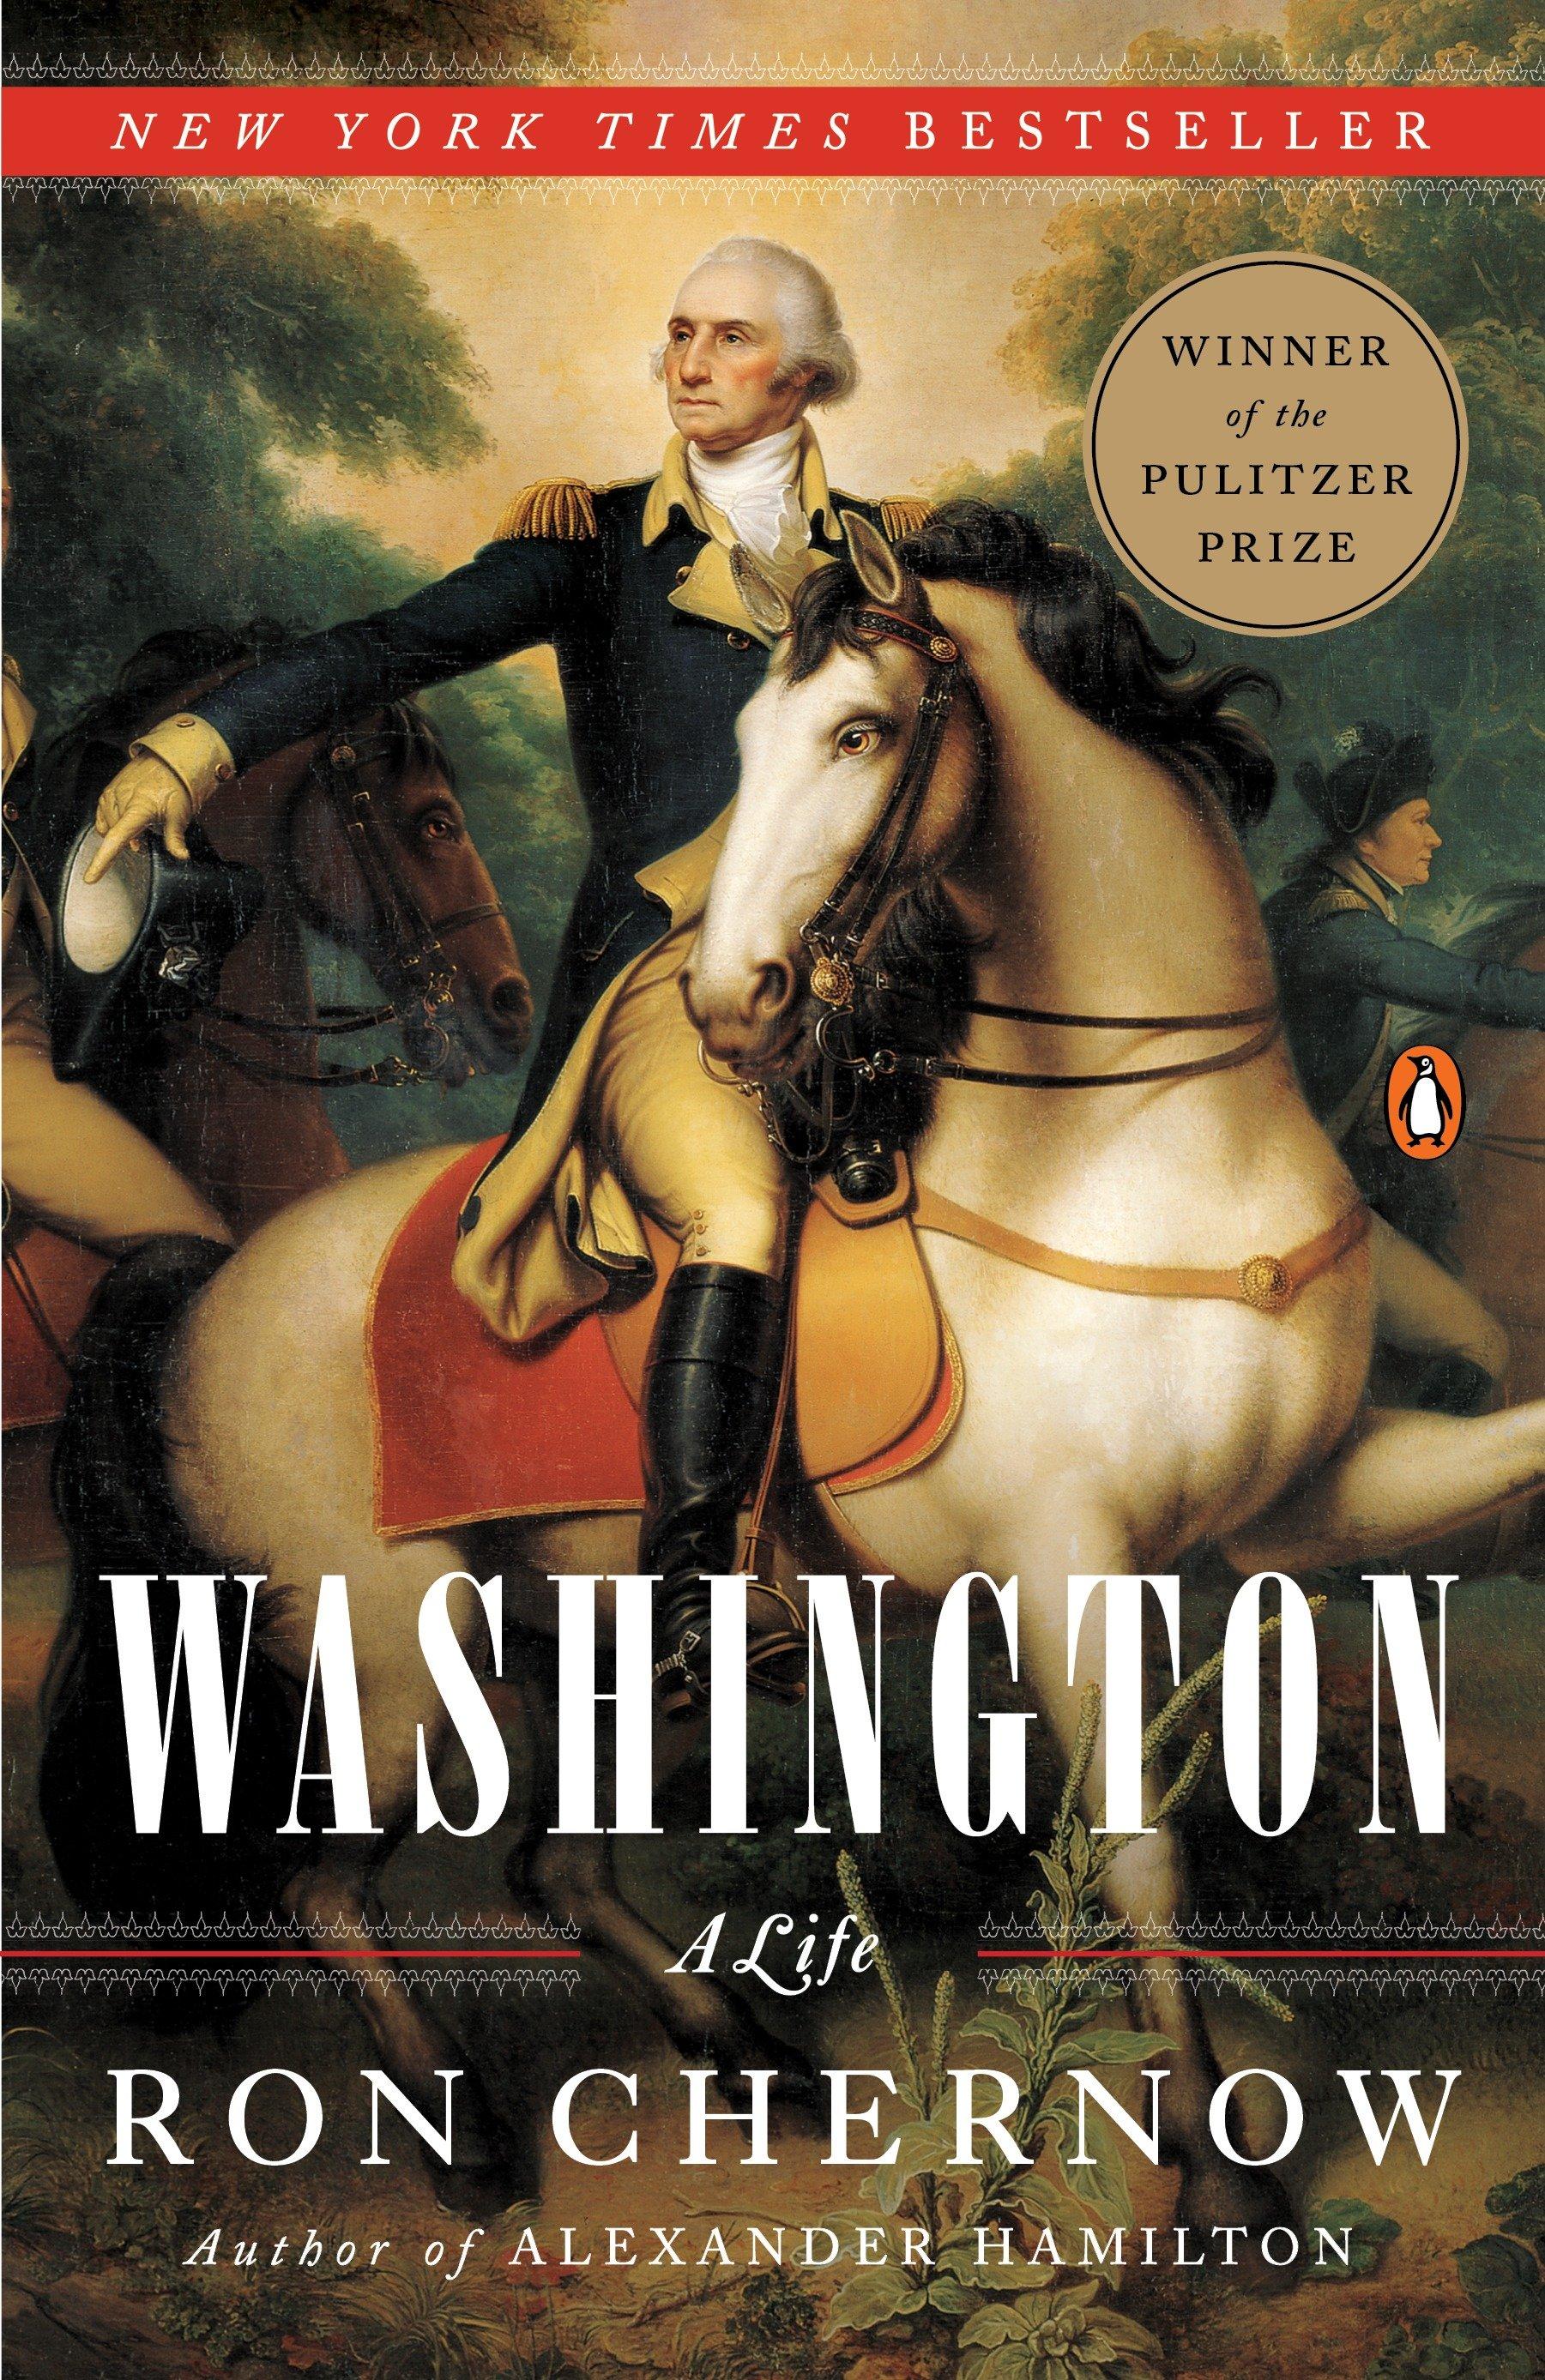 Washington a life cover image